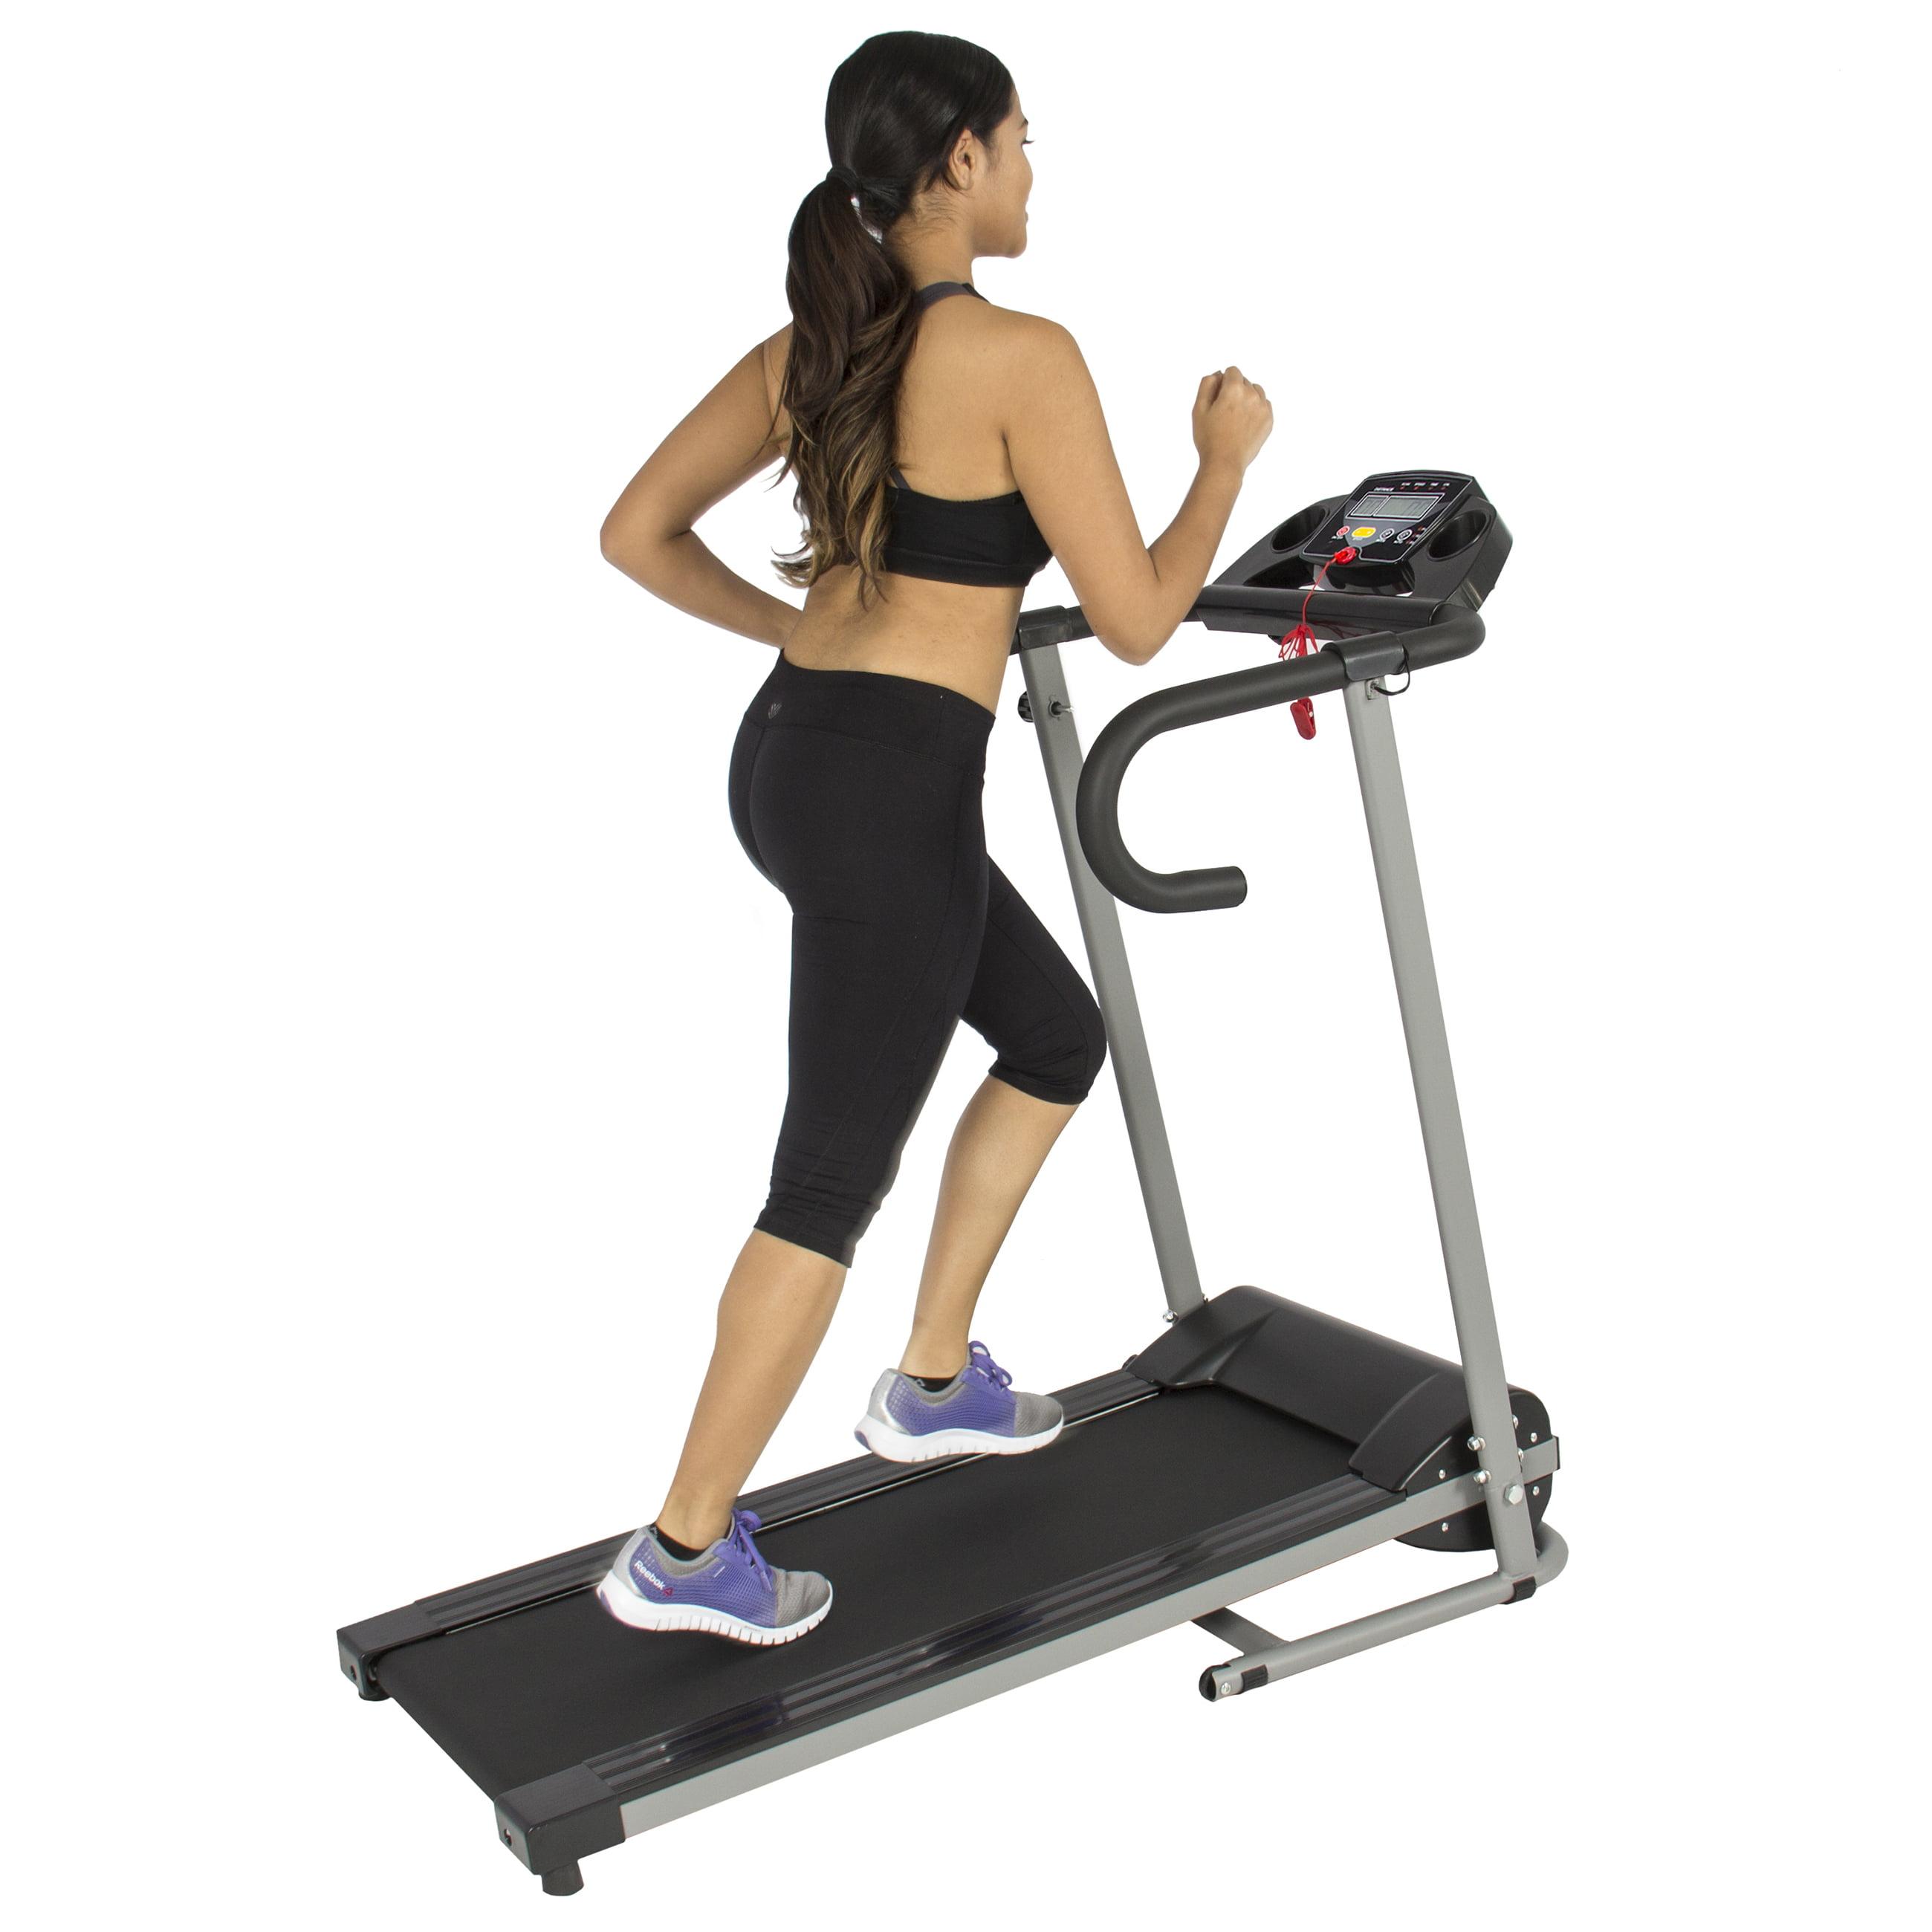 1100W Folding Electric Treadmill Portable Motorized Running Fitness Machine BK - Walmart.com